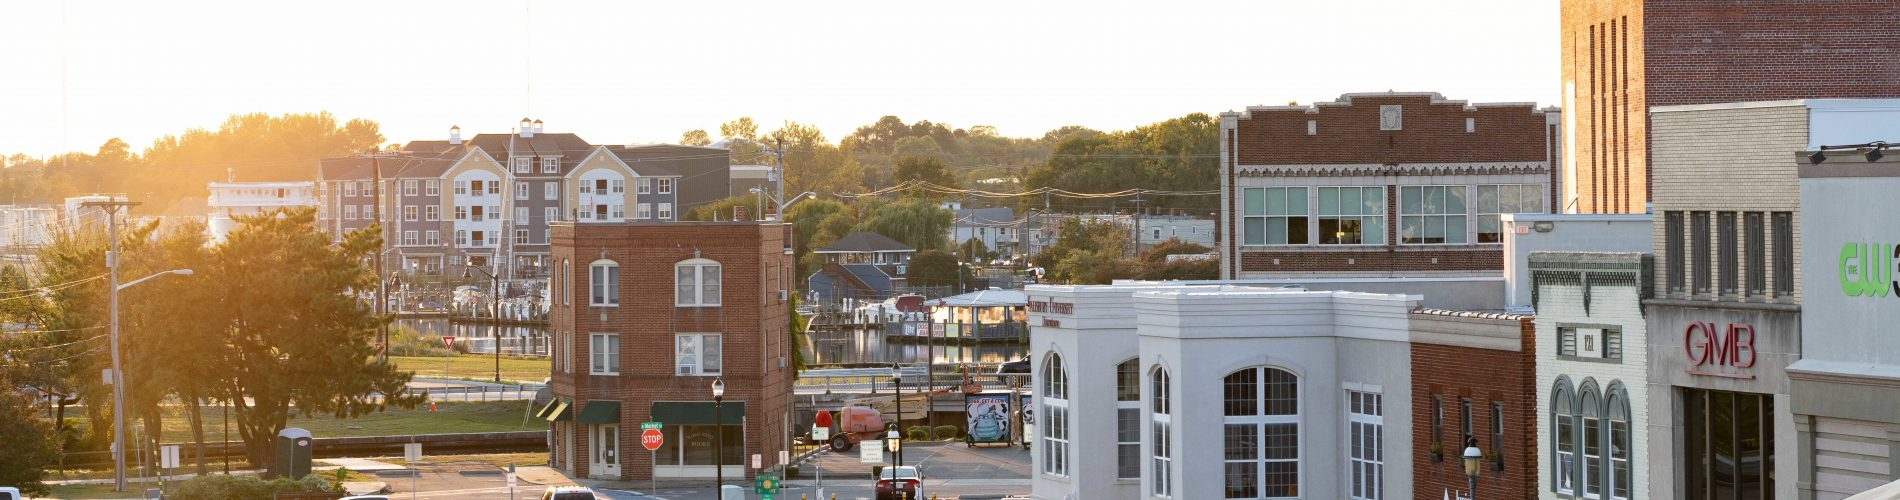 A Sunset Photo of Downtown Salisbury MD